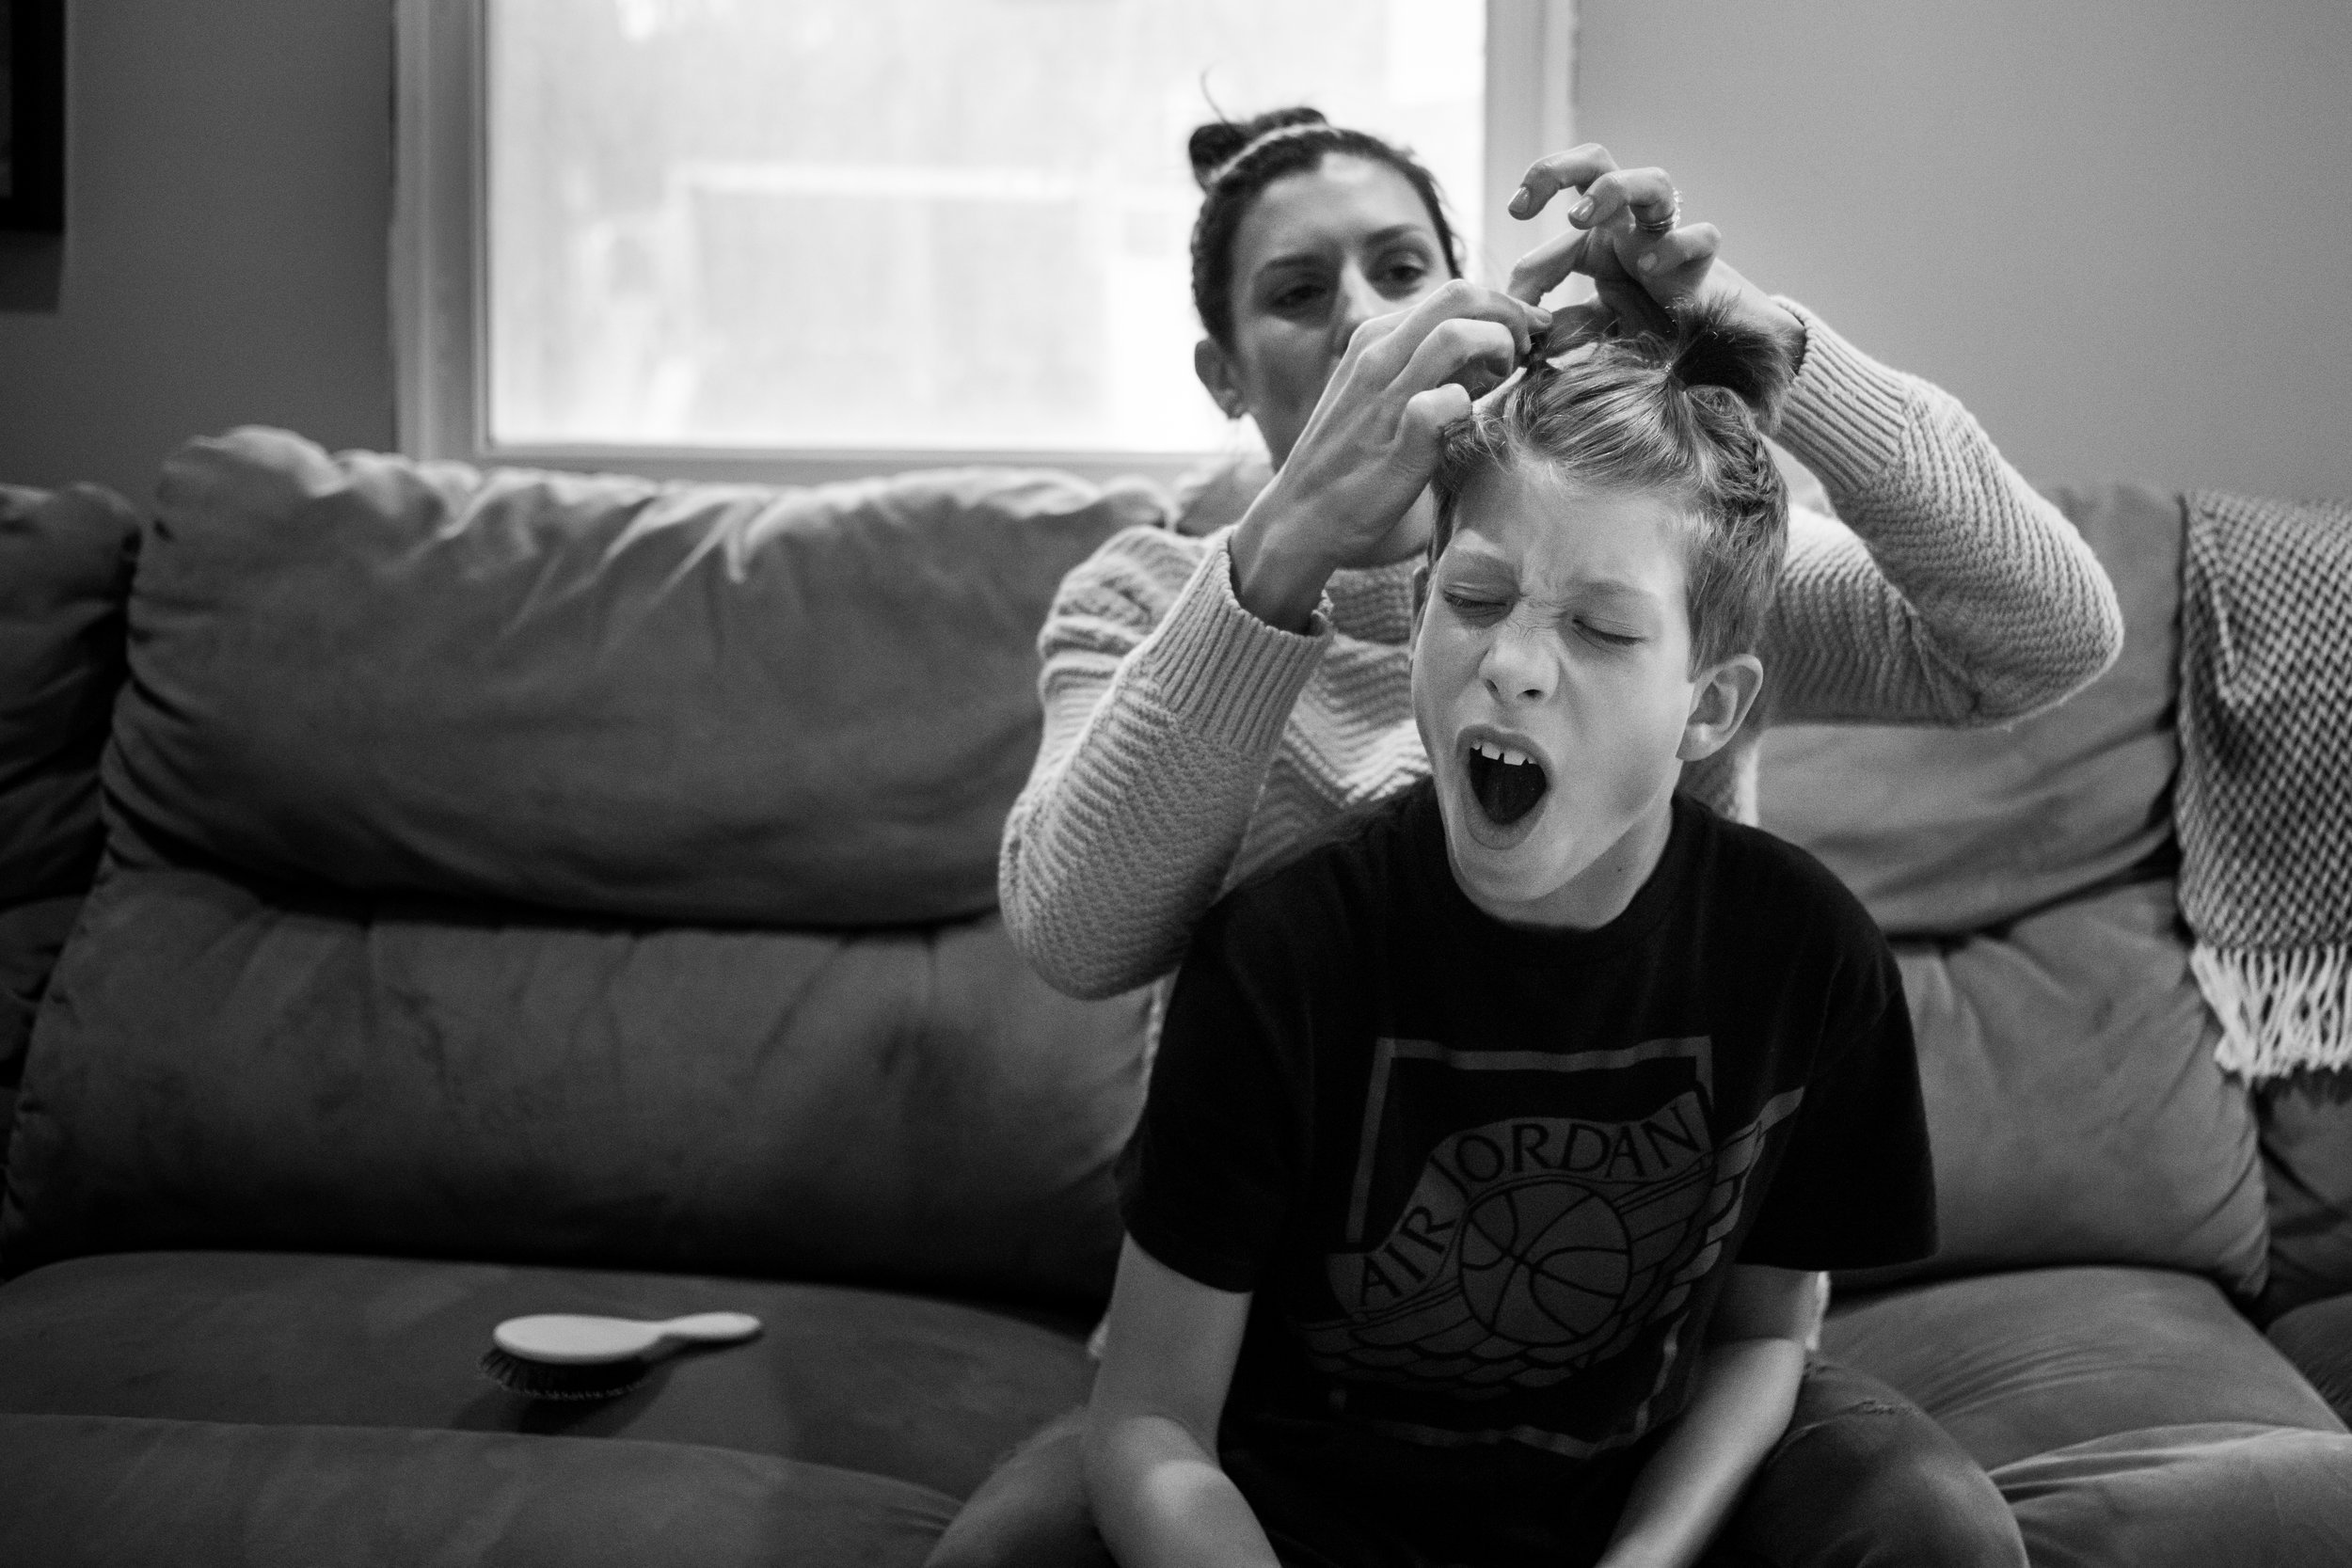 JuliaMatthewsPhotography_MadisonWisconsinFamilyPhotography_Documentary-32.jpg